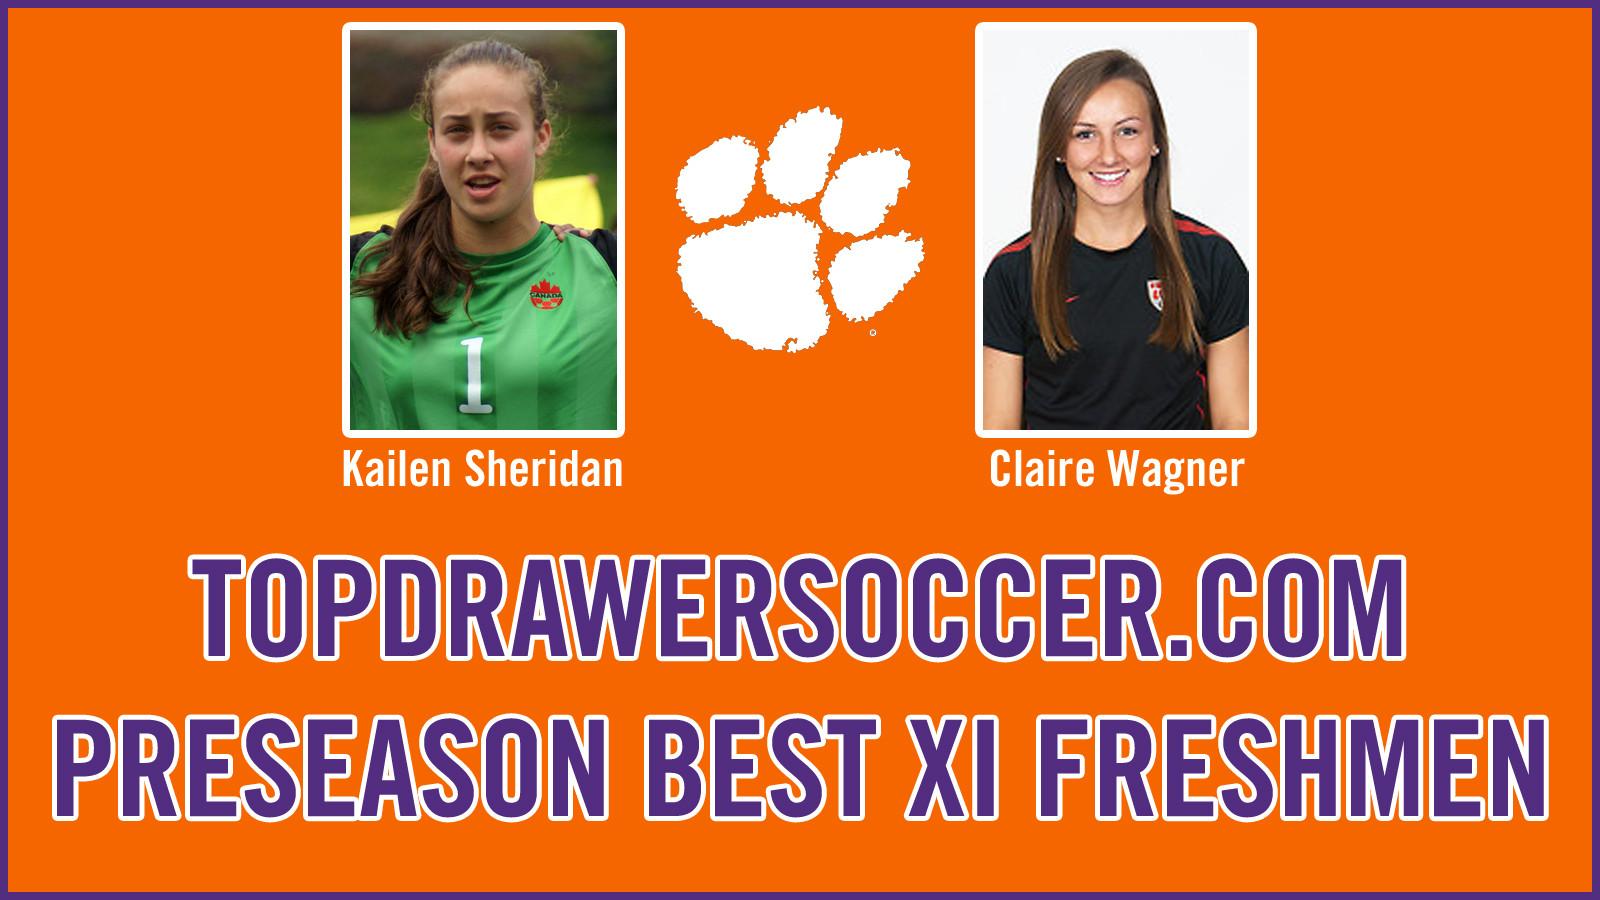 Sheridan and Wagner Named to TopDrawerSoccer.com's Preseason Best XI Freshmen Team